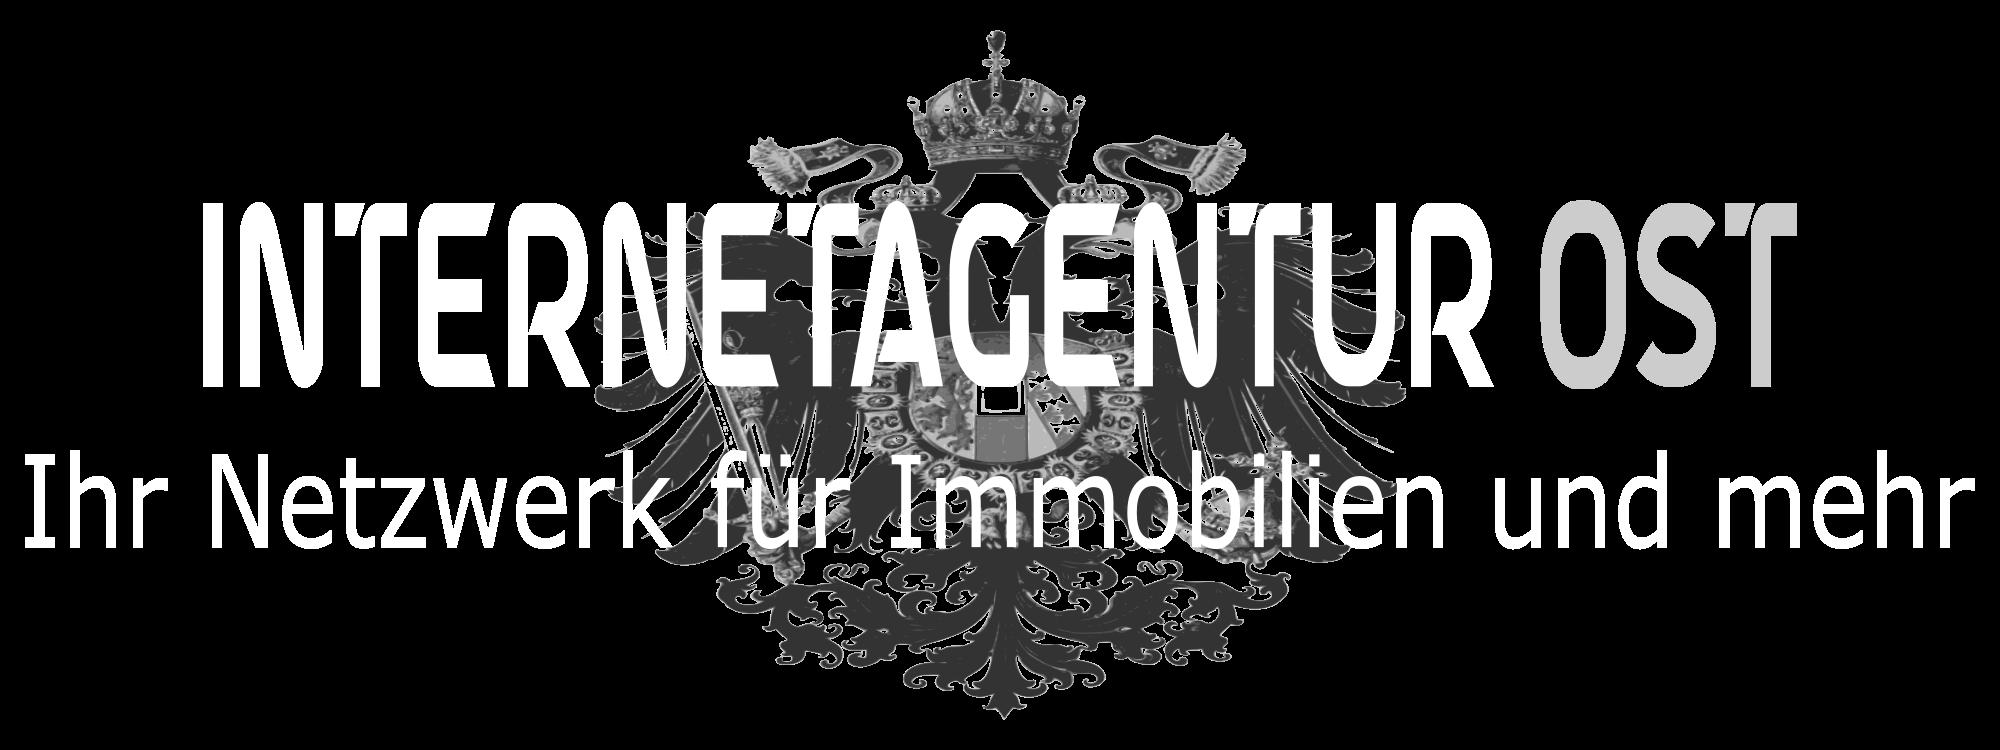 Internetagentur Ost